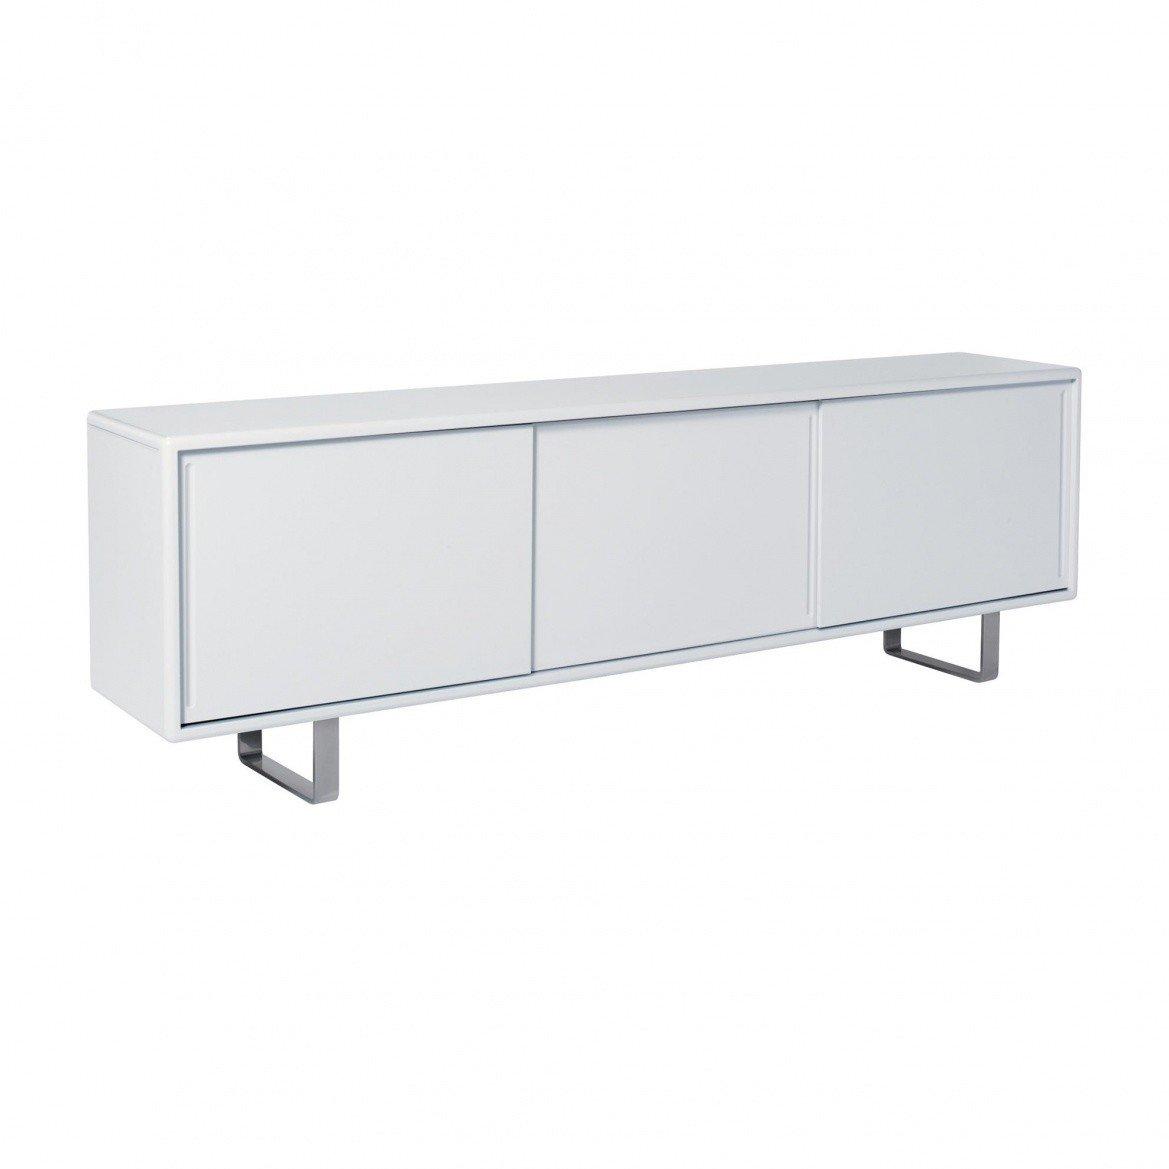 Mller Mbelfabrikation K16 S4 Sideboard With 3 Sliding Doors